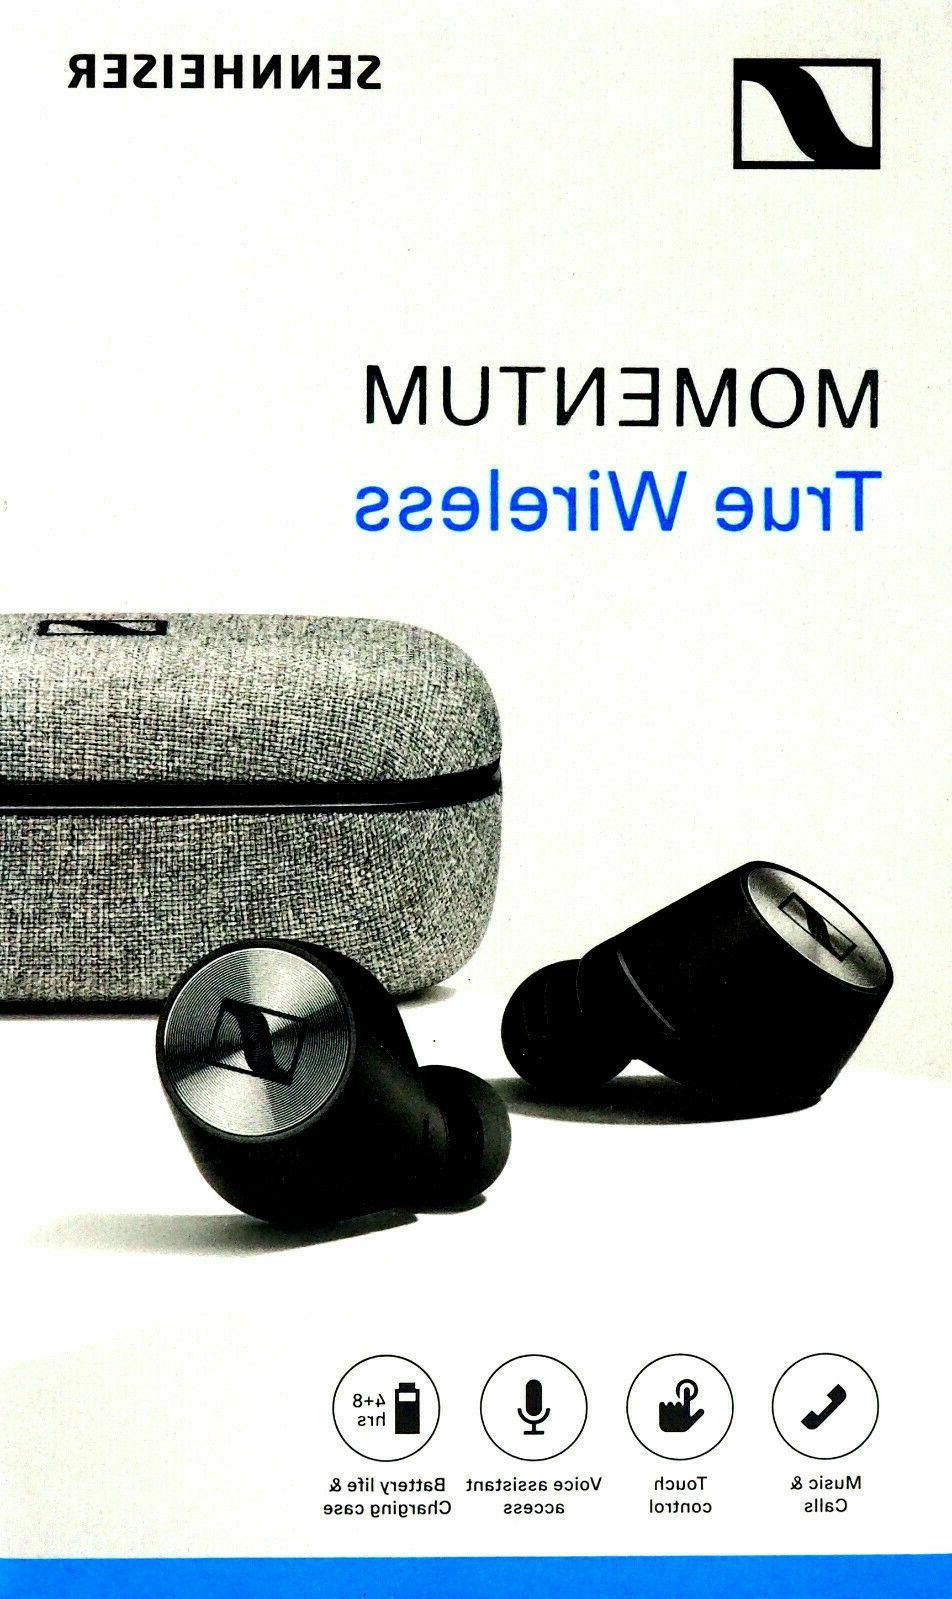 Sennheiser Momentum True Wireless Bluetooth Earbuds with Fin